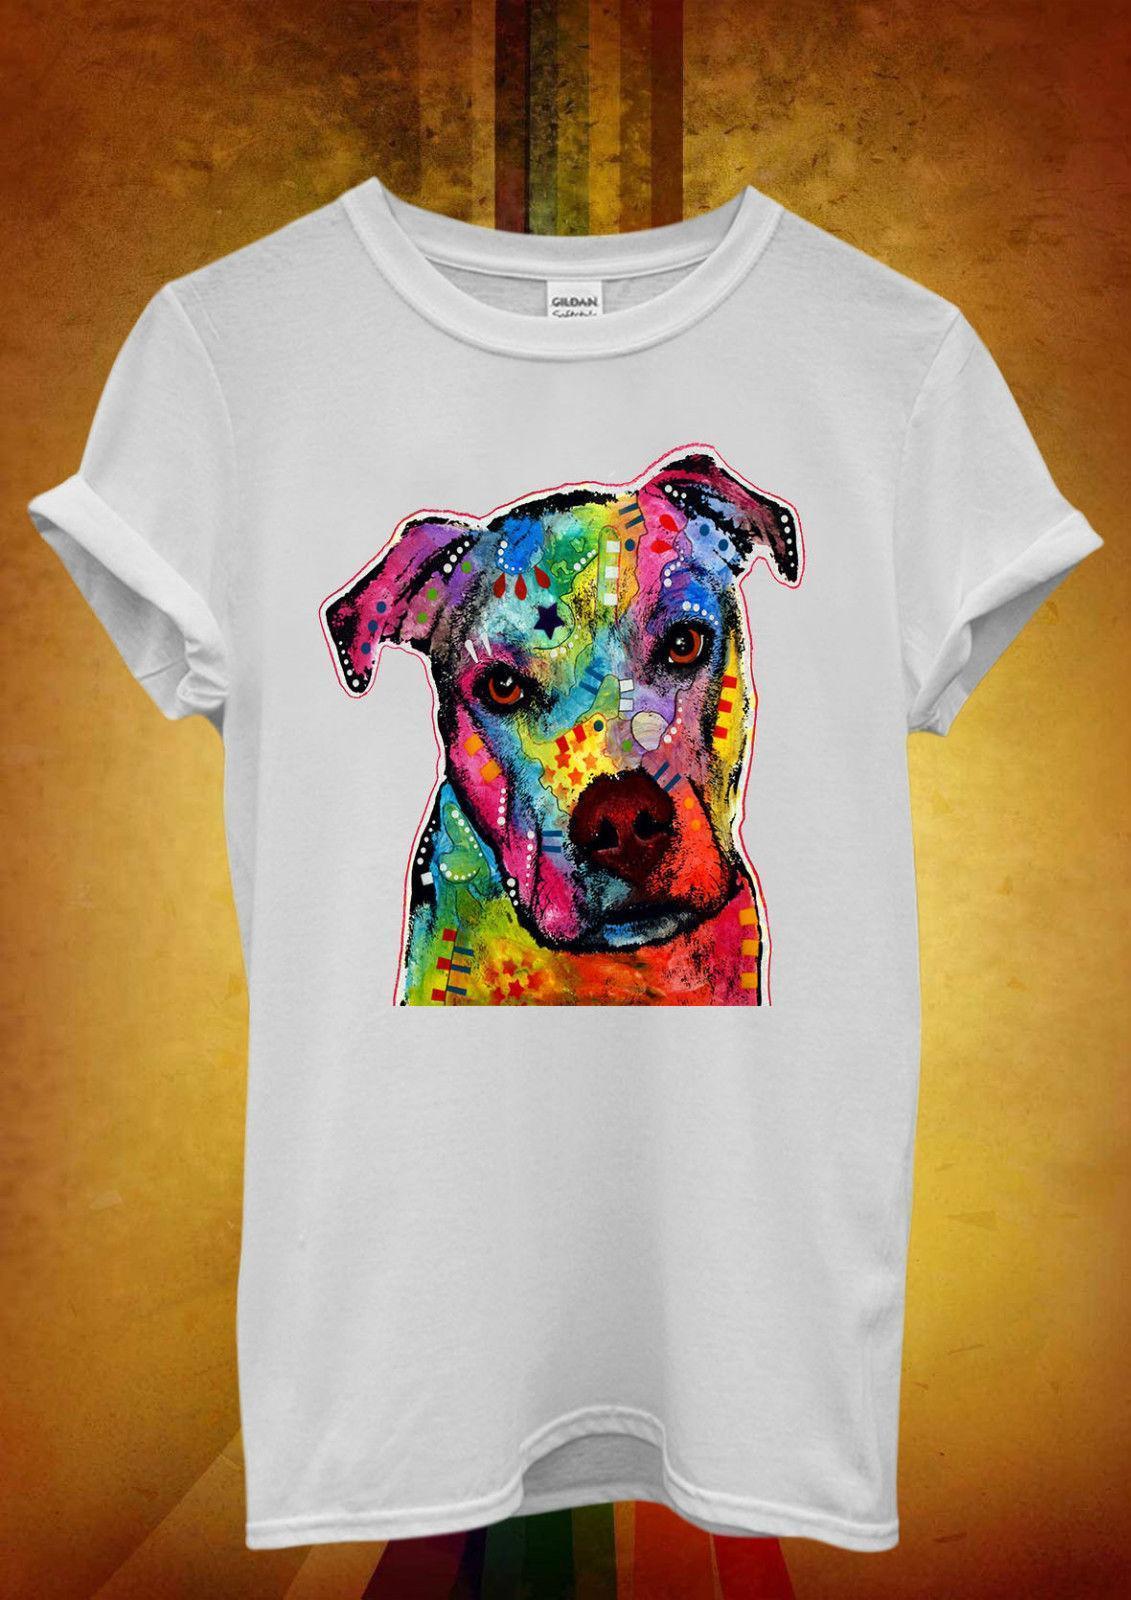 5b7e4a24c32e Dog Animal Doggie Cute Painting Art Men Women Unisex T Shirt Tank Top Vest  898 Buy T Shirt Fun Shirt From Linnan00005, $14.67| DHgate.Com